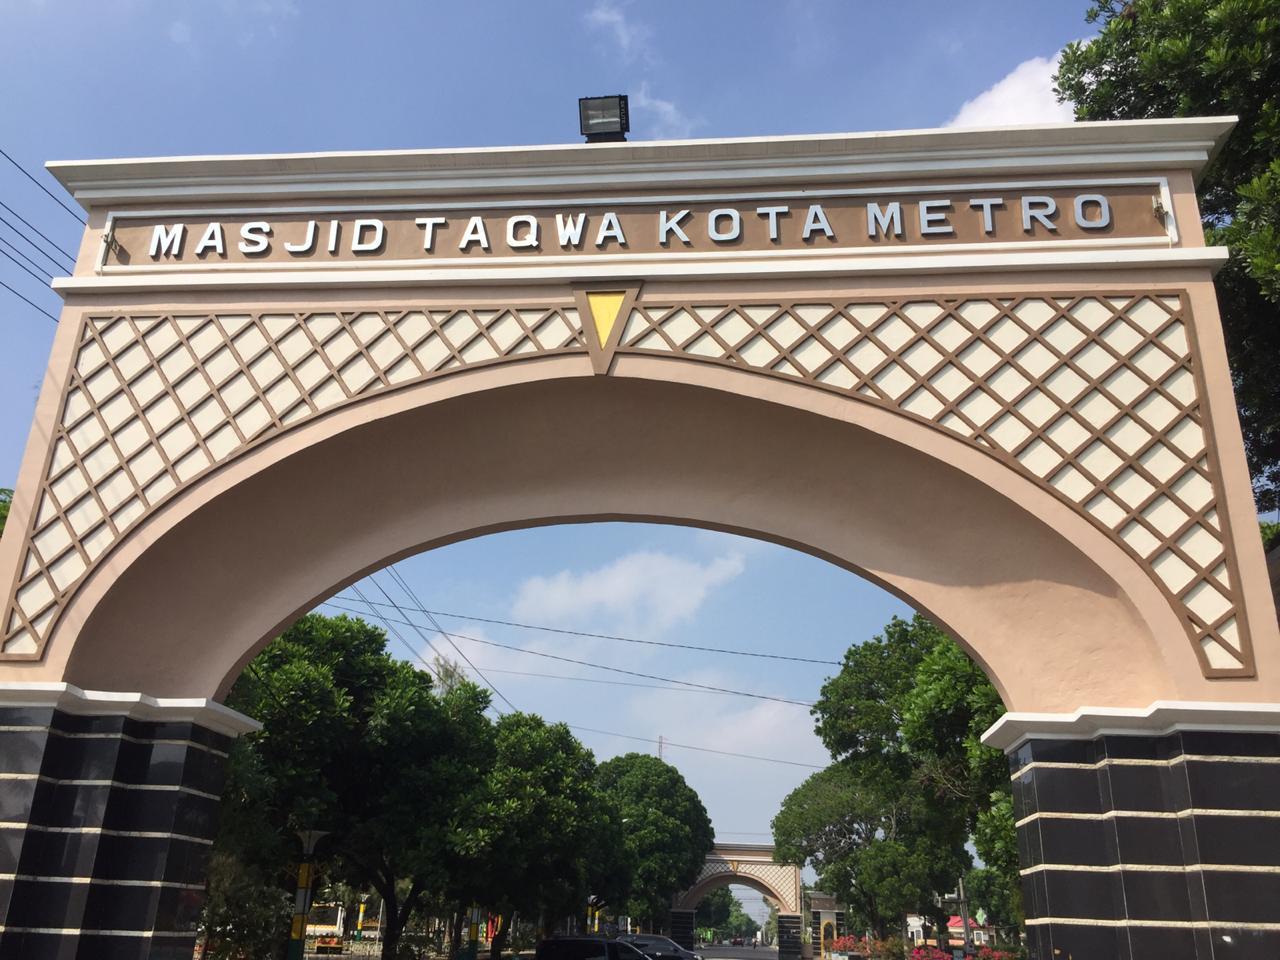 MASJID TAQWA, Sang Ikon Kota Metro